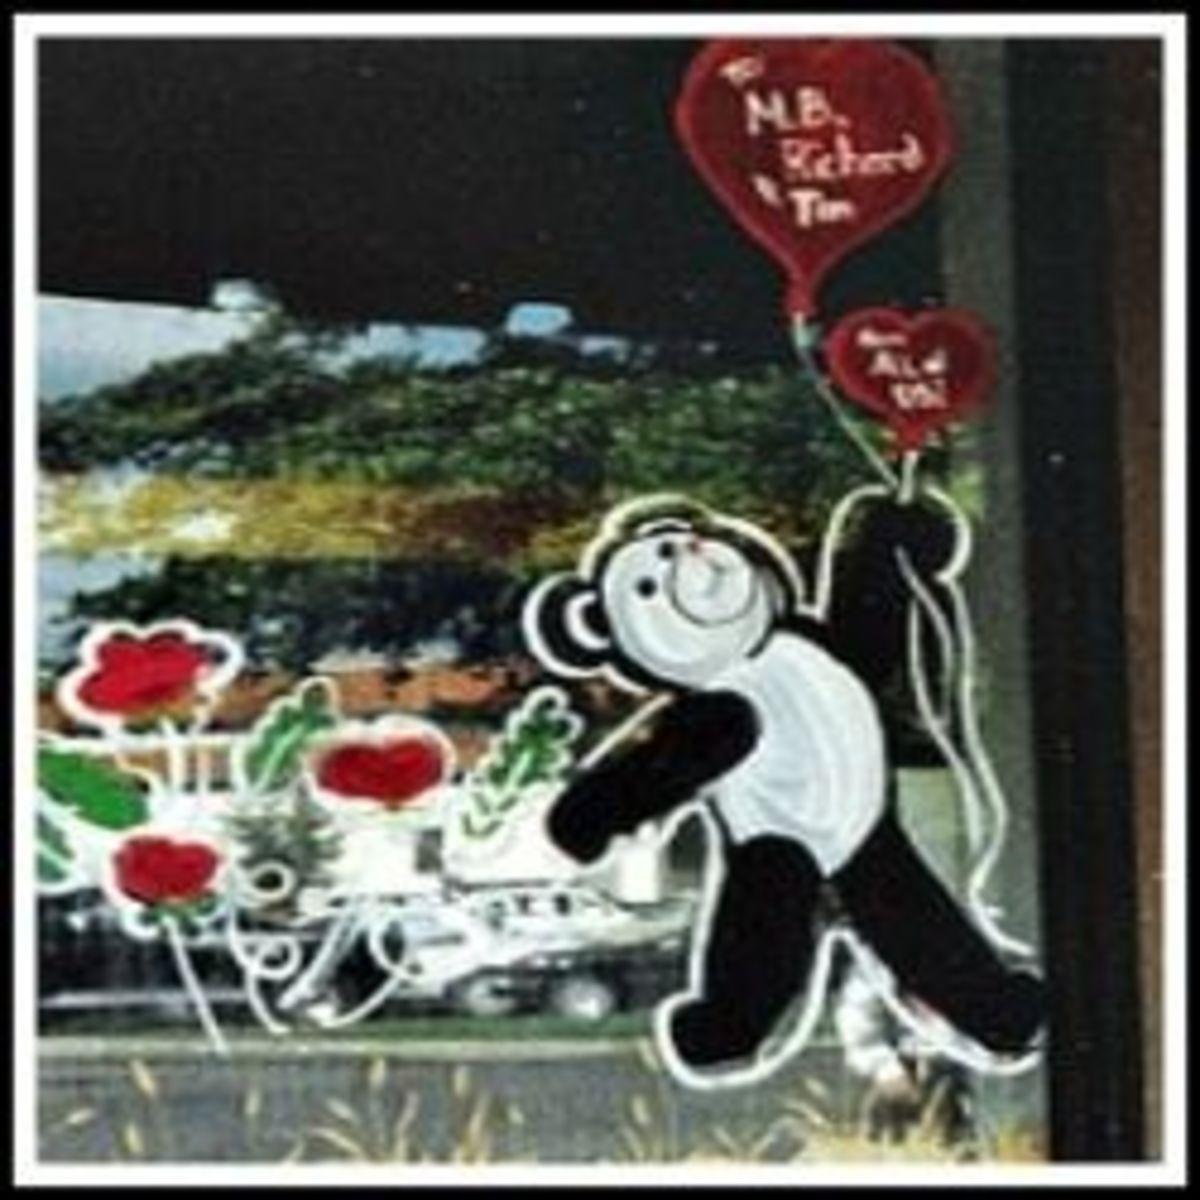 Valentines-Panda-Bear-Balloons-Flowers-Hearts-MBurgess